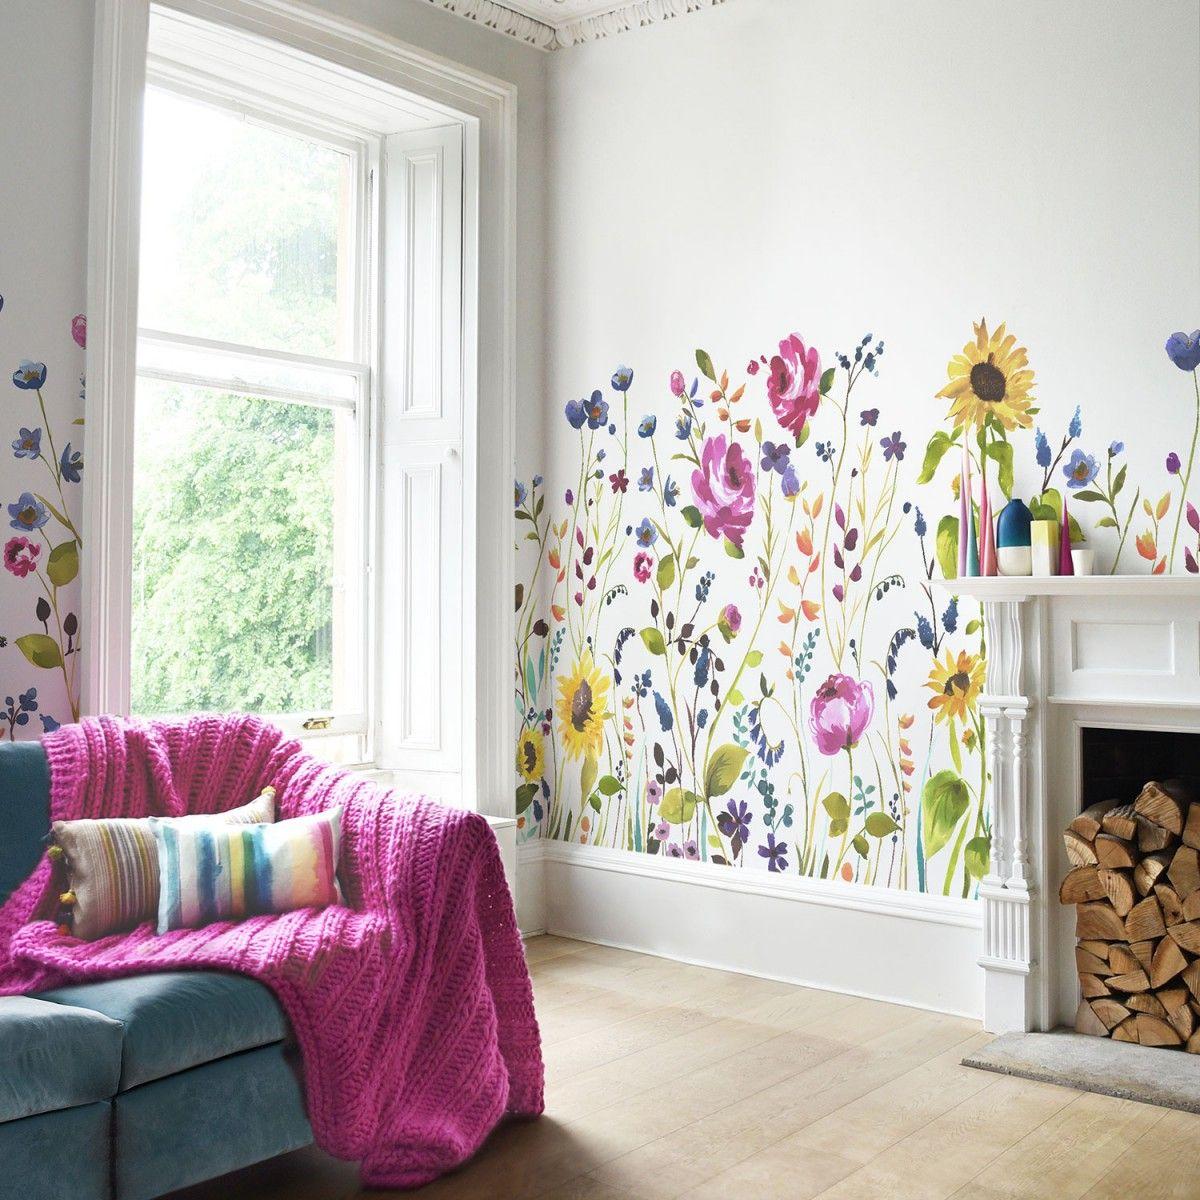 25 Wall Mural Designs: Home Decor, Wallpaper Samples, Decor